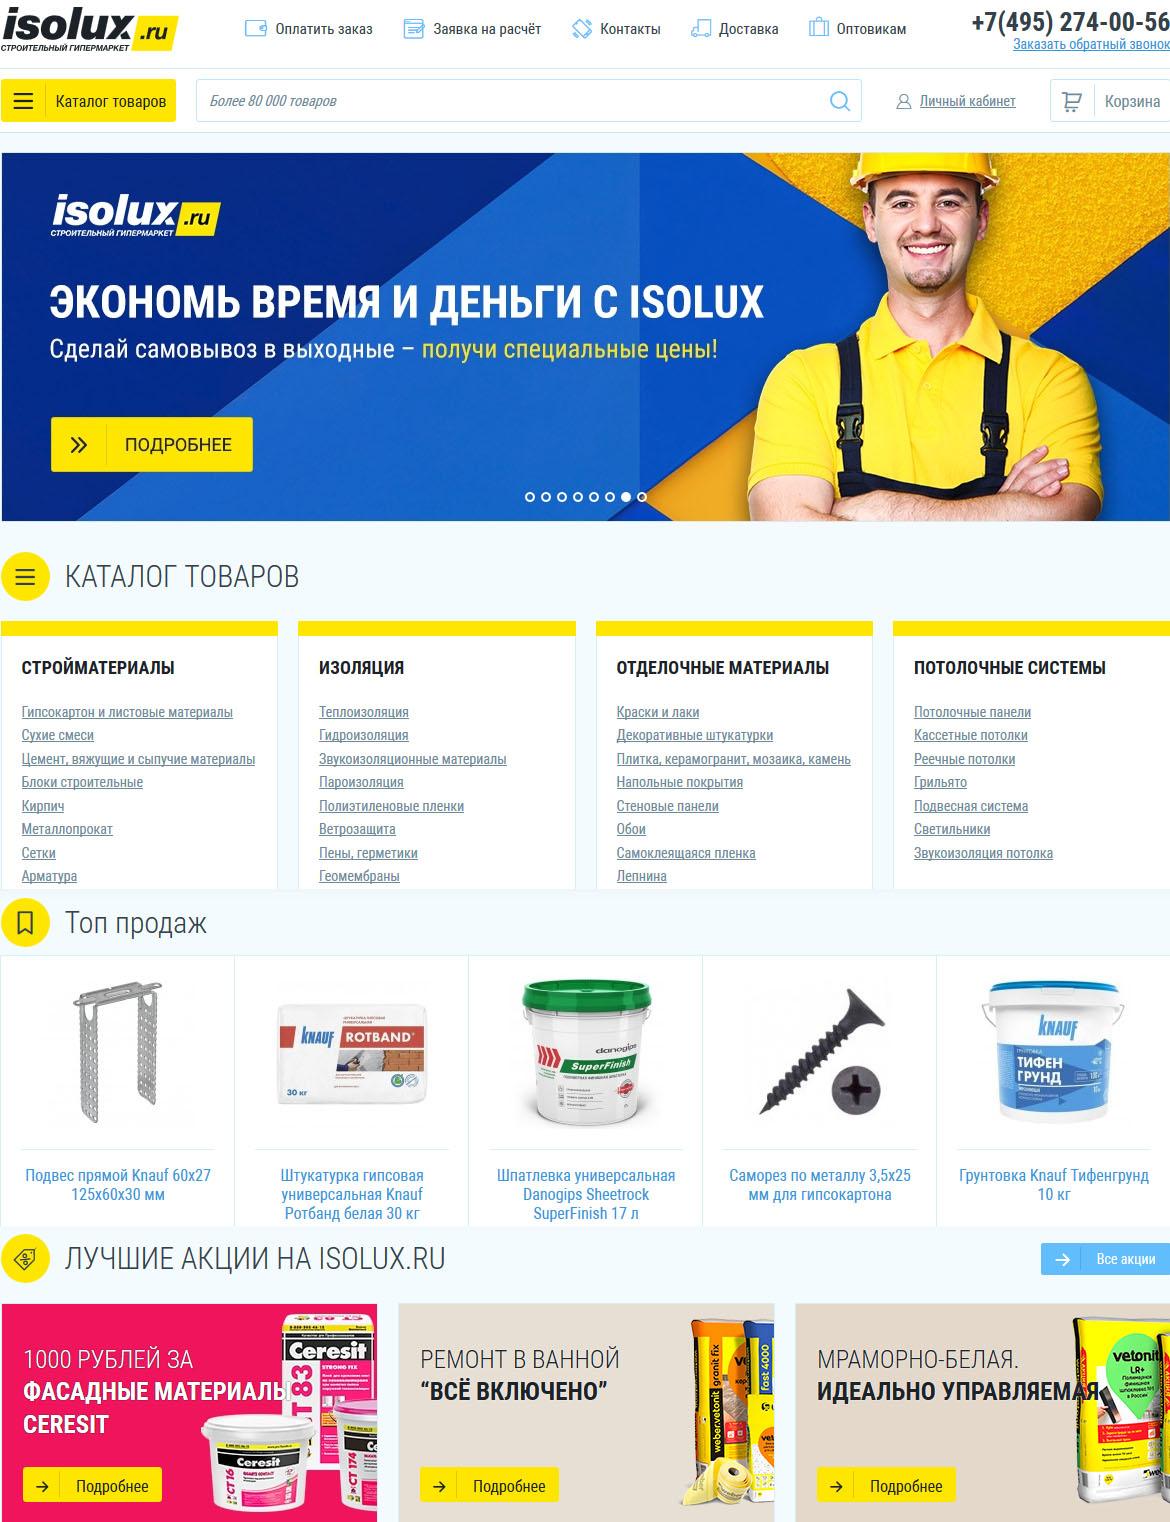 Интернет-магазин Изолюкс